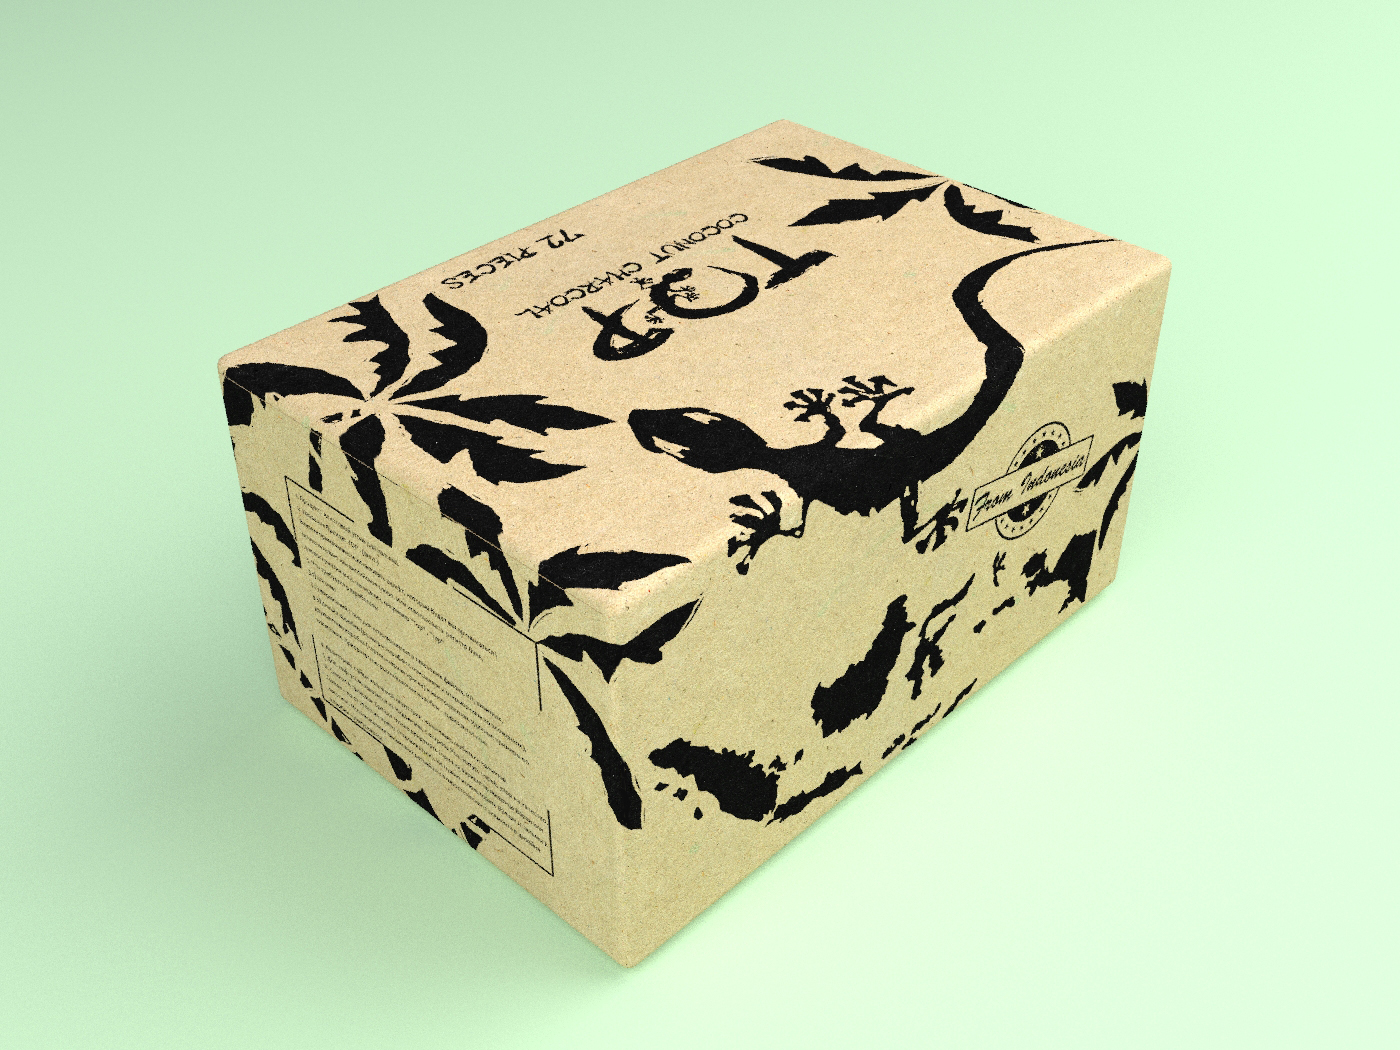 Разработка дизайна коробки, фирменного стиля, логотипа. фото f_8915c5fcda95febc.jpg